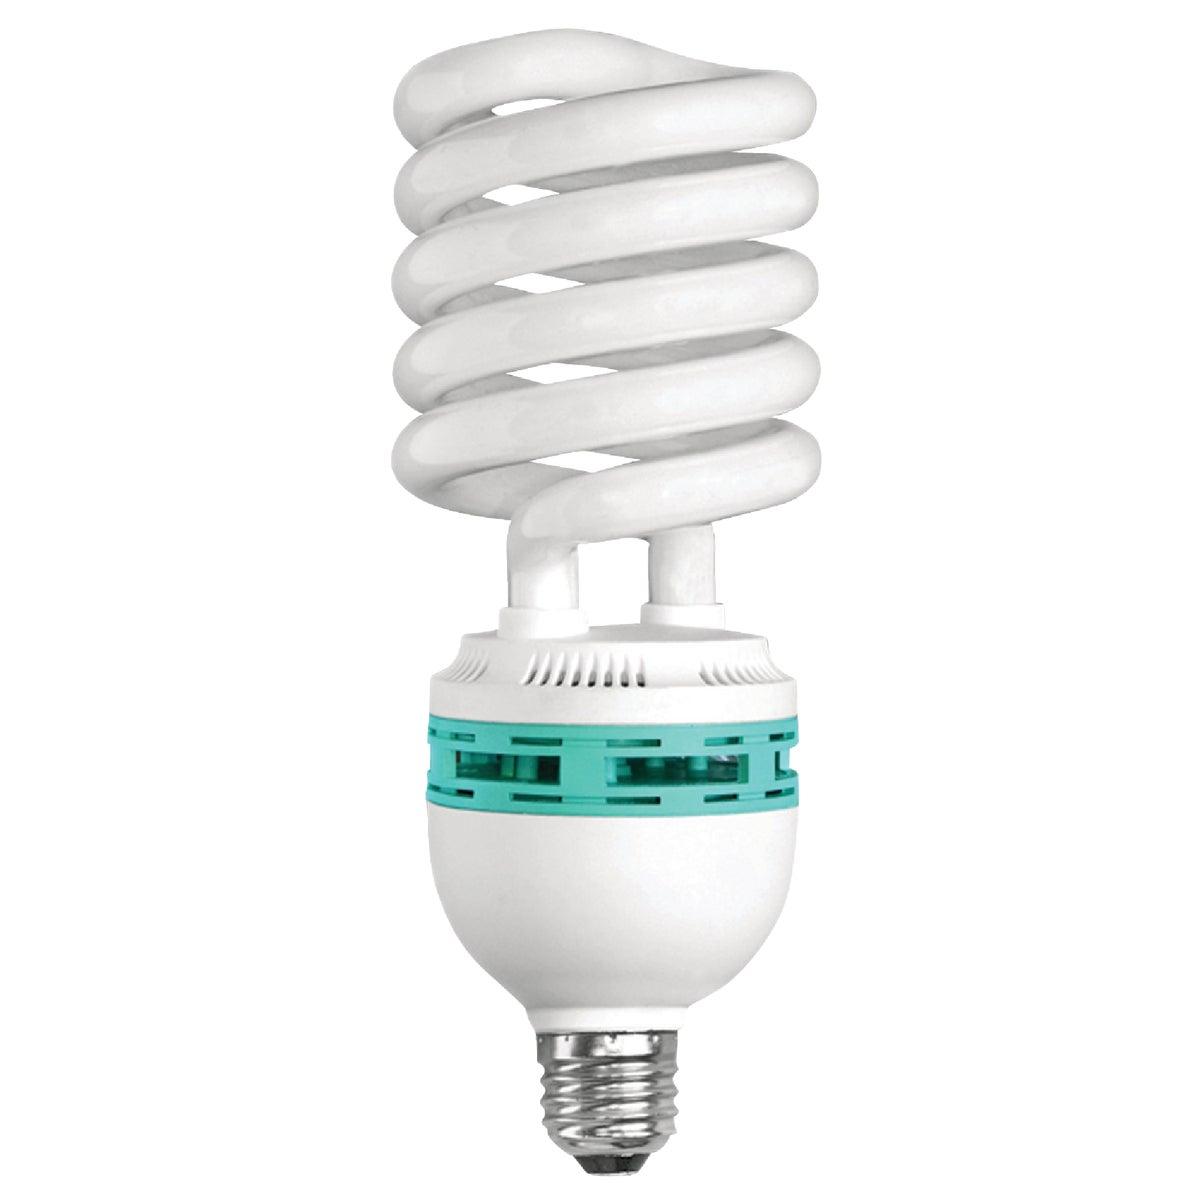 Wobble Light 85W CFL REPLACEMENT BULB WL62260